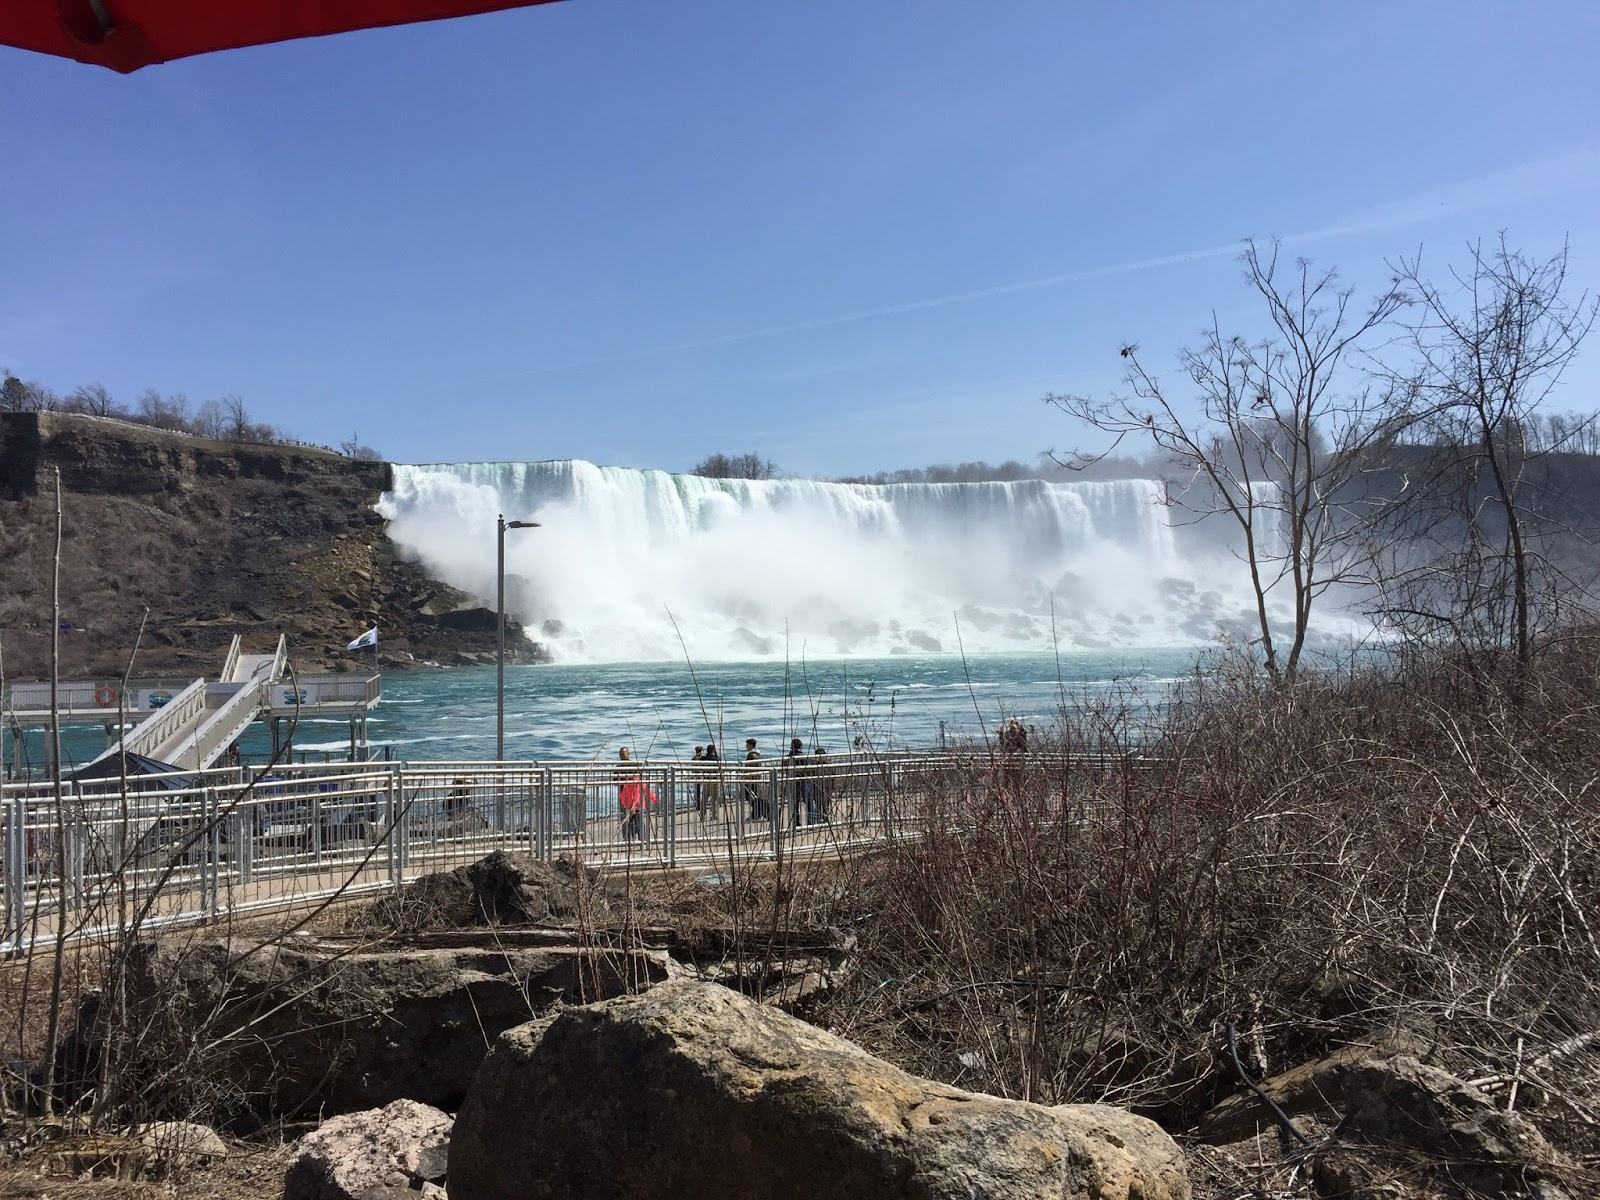 Travel Reviews Amp Information Niagara Falls Ontario Canada Attraction Information And Photos